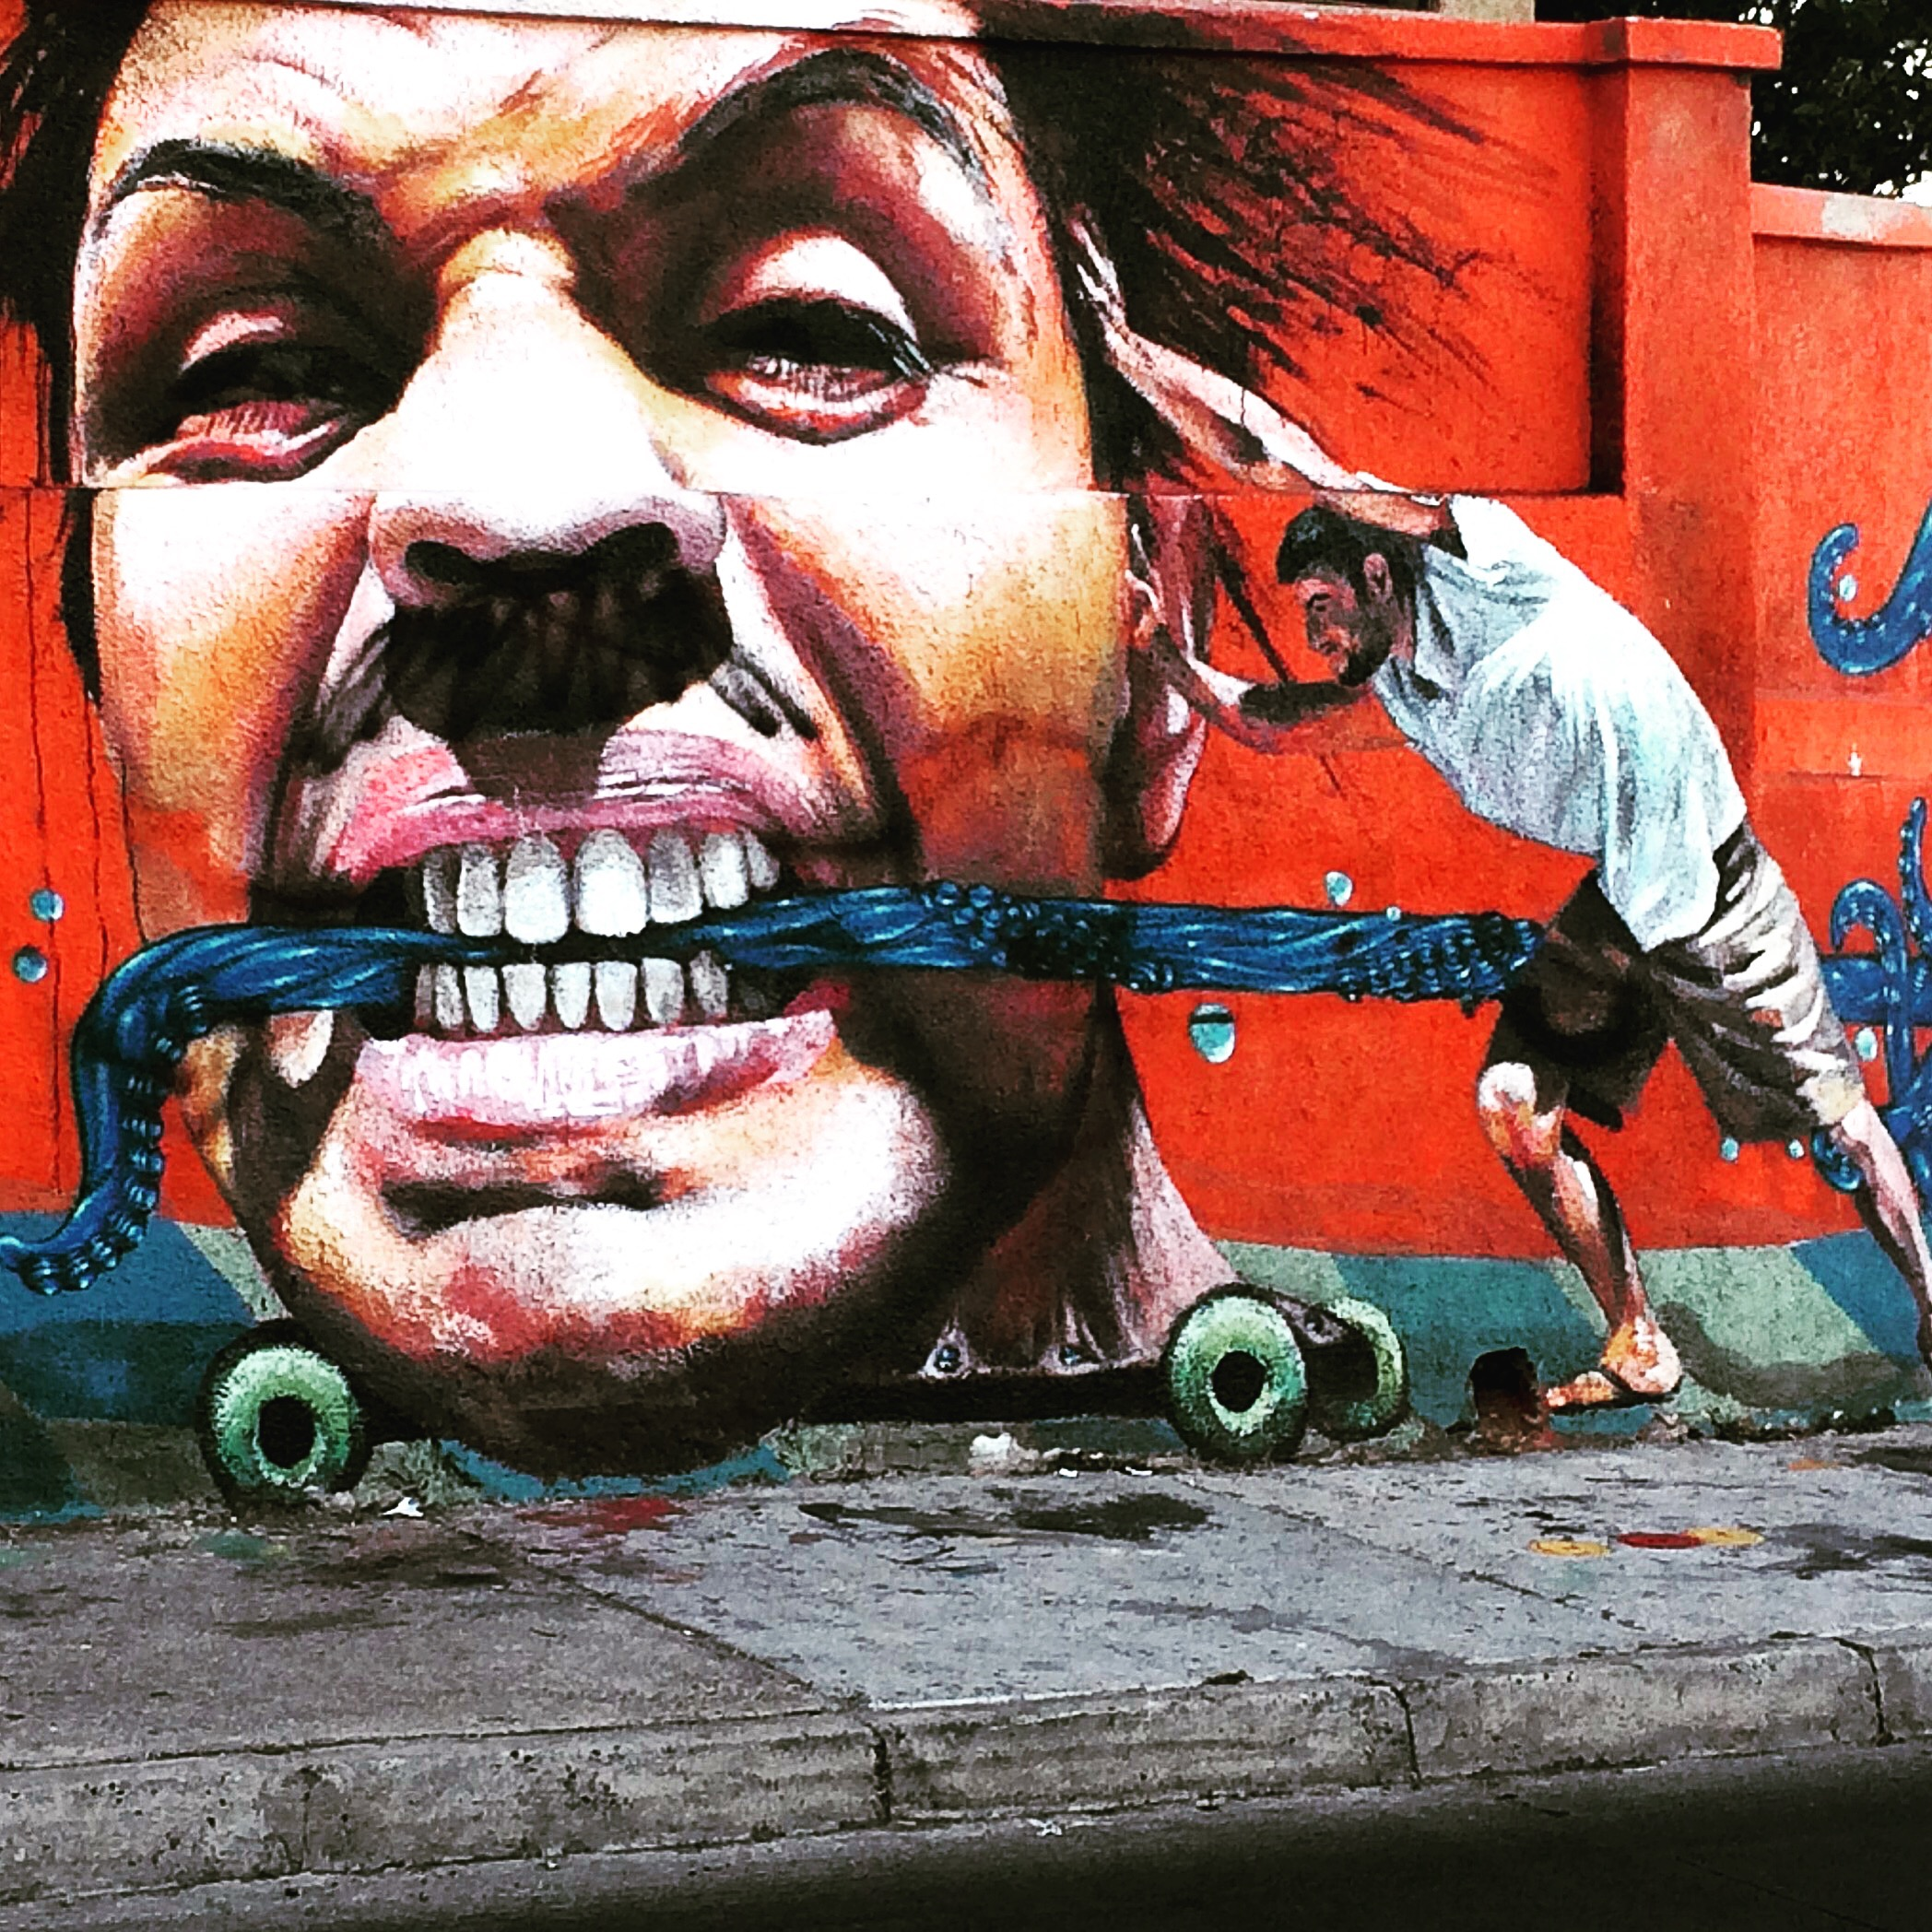 Martin Ron Mural, Valparaiso Chile - 3 Days*